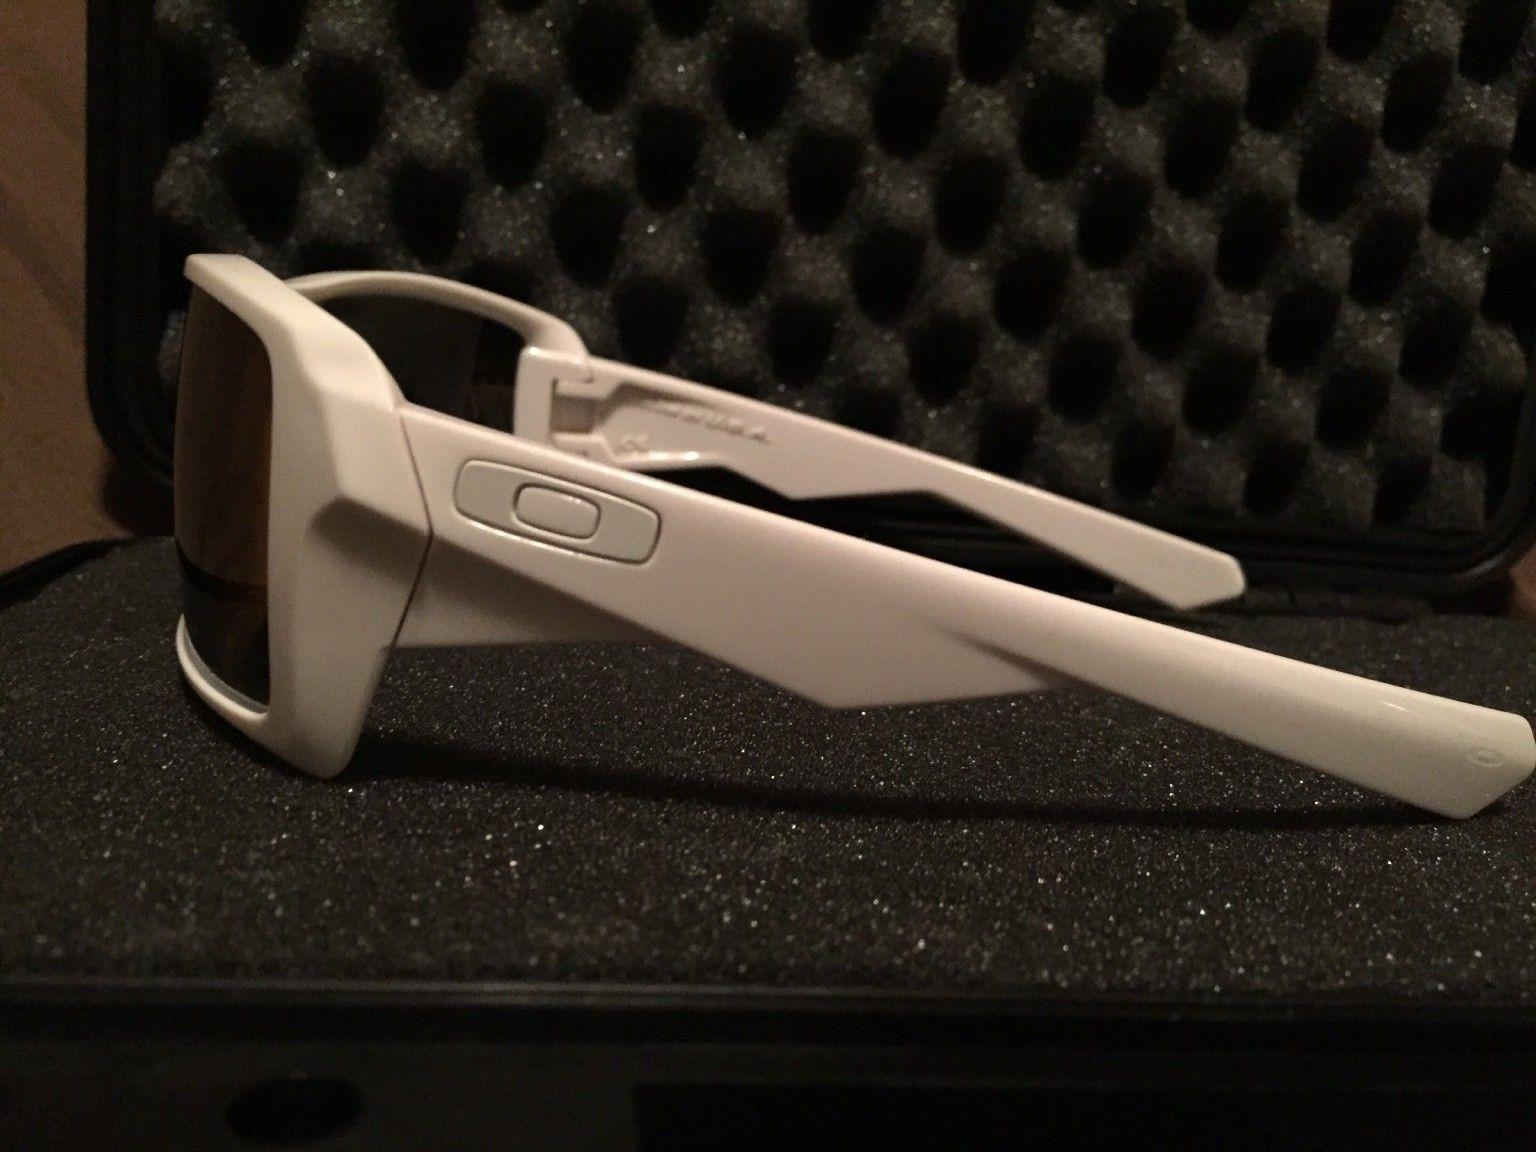 White Eyepatch 1's. Includes unused Titanium Lenses - ImageUploadedByTapatalk1455335827.722114.jpg